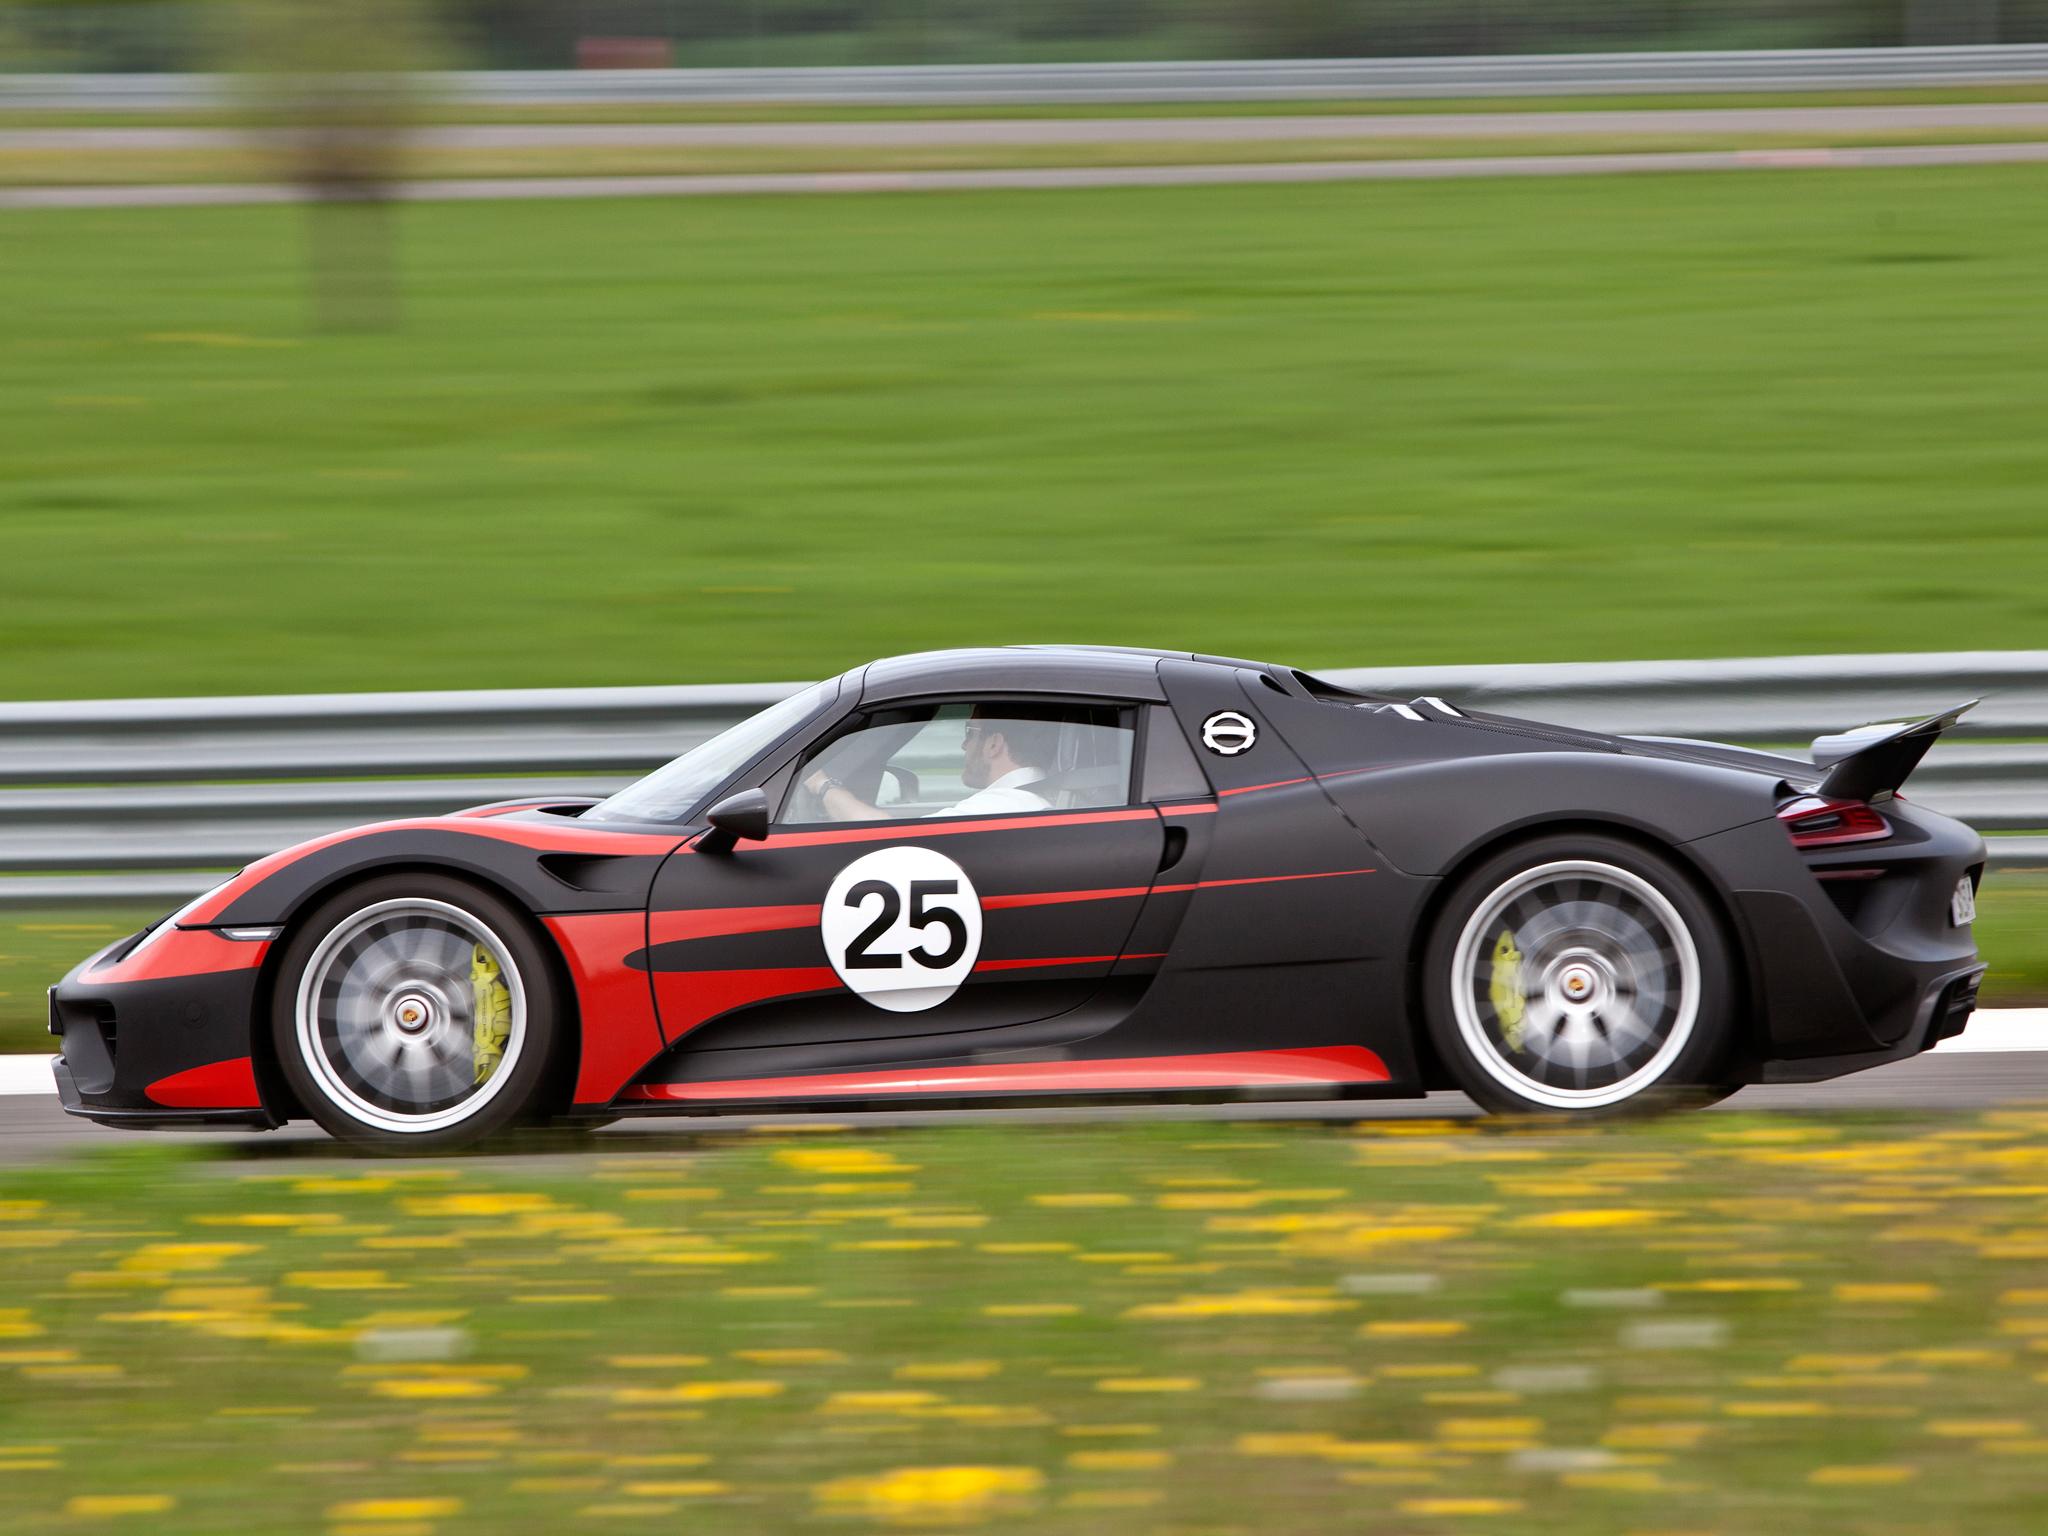 2013 porsche 918 spyder prototype supercars supercar race racing wallpaper. Black Bedroom Furniture Sets. Home Design Ideas